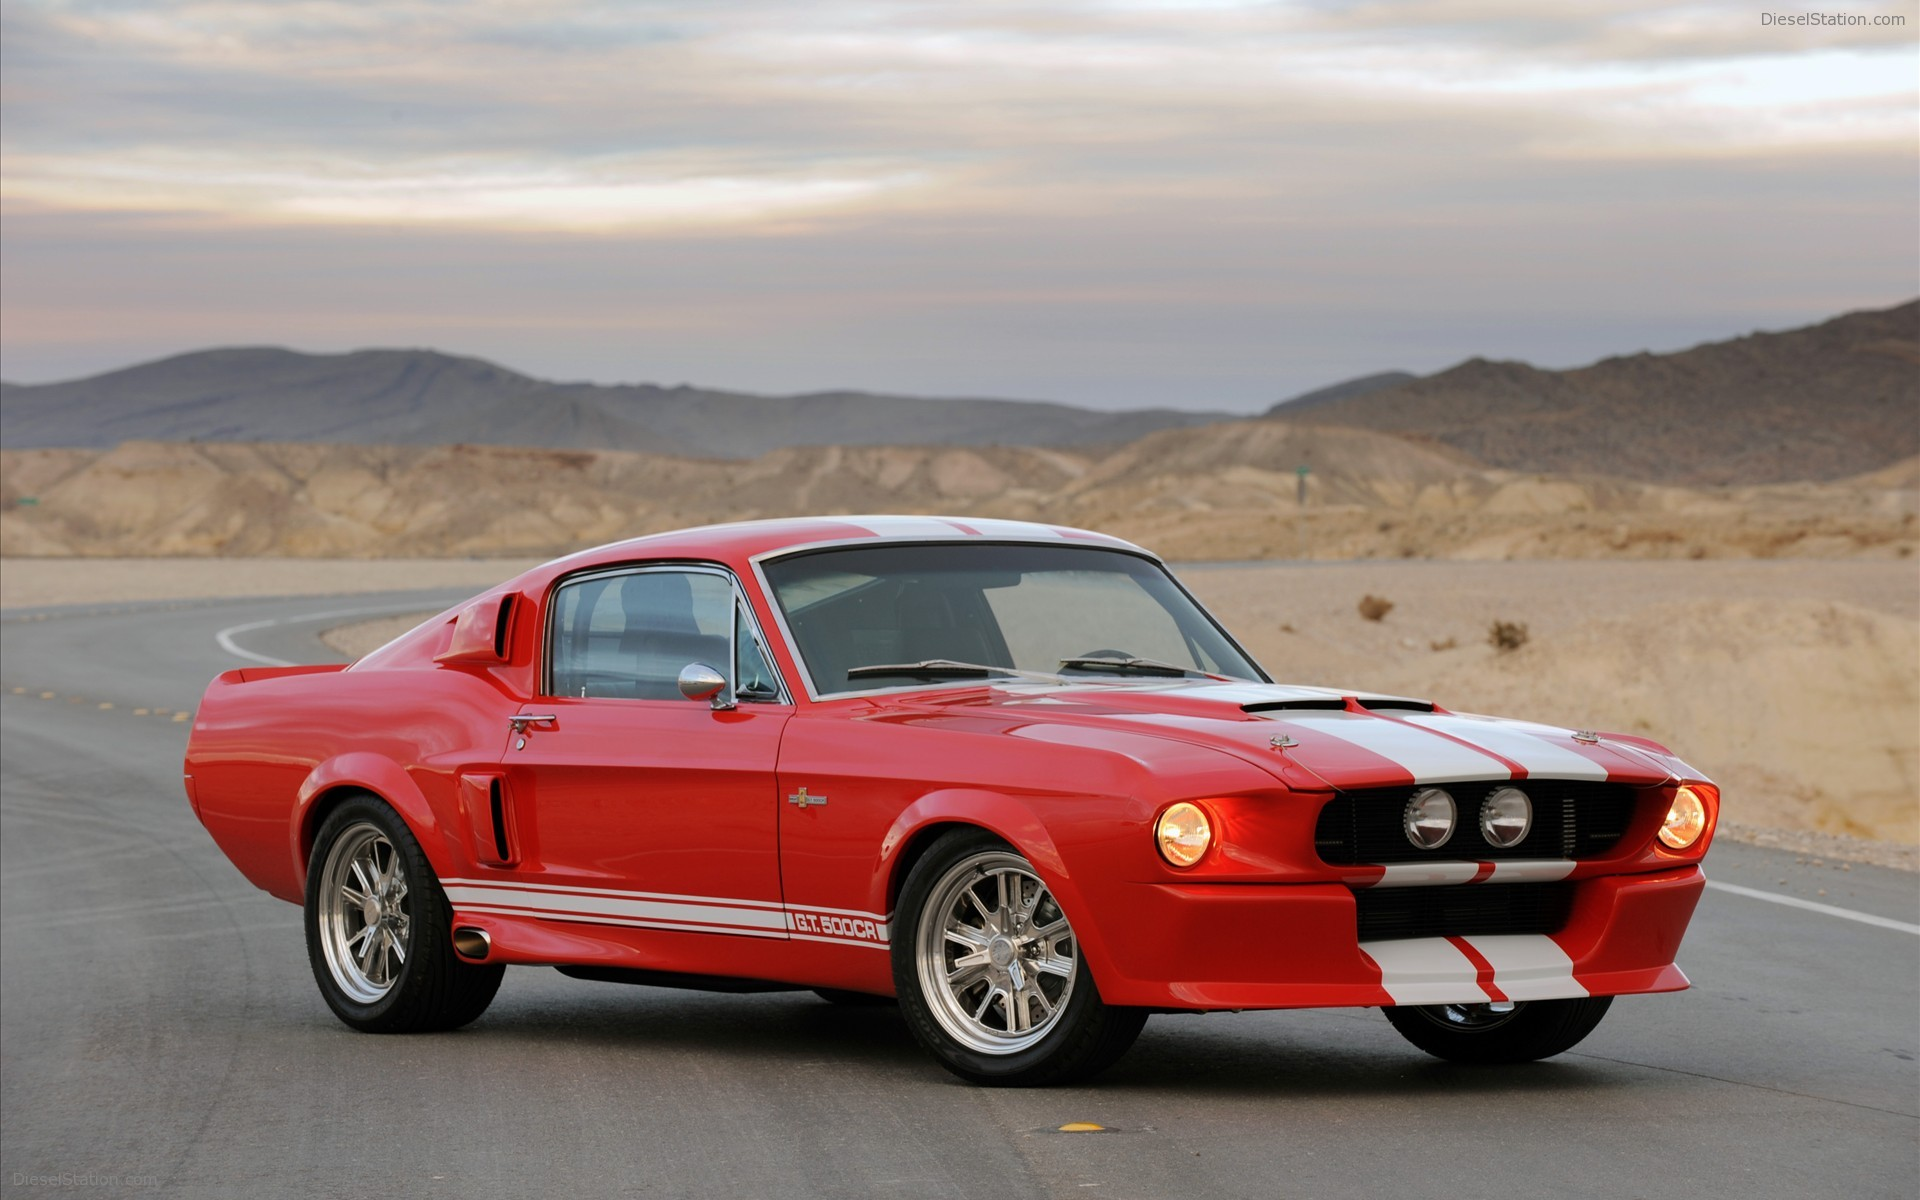 67 Mustang Gt500 Wallpaper Mustang fastback shelby 1920x1200